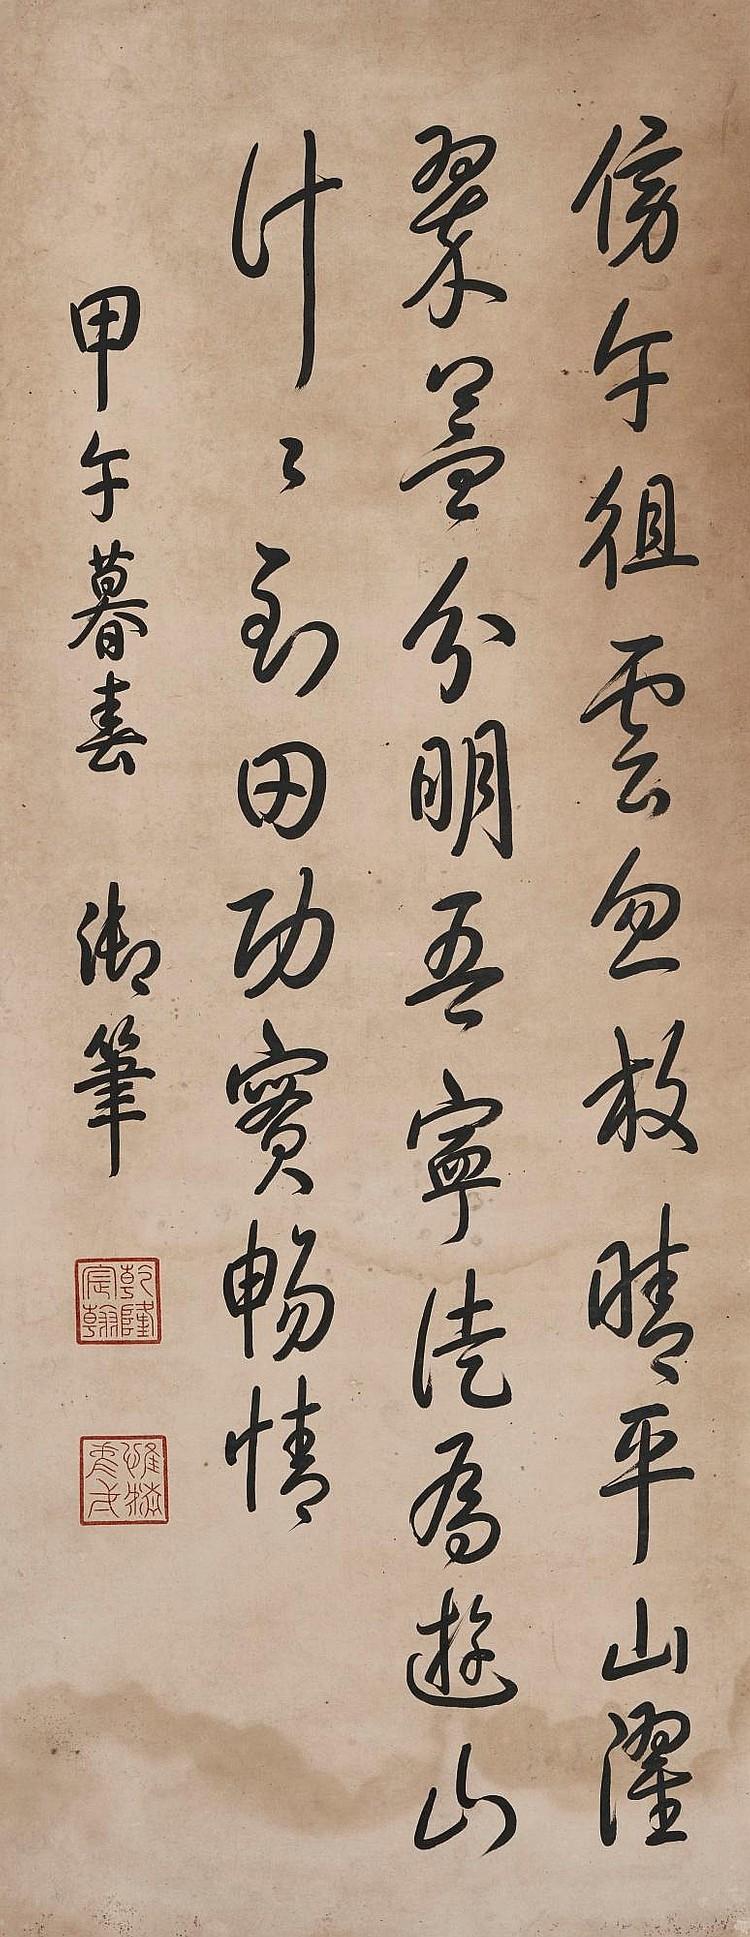 HONGLI (EMPEROR QIANLONG) 1711-1799 | POEM IN RUNNING SCRIPT